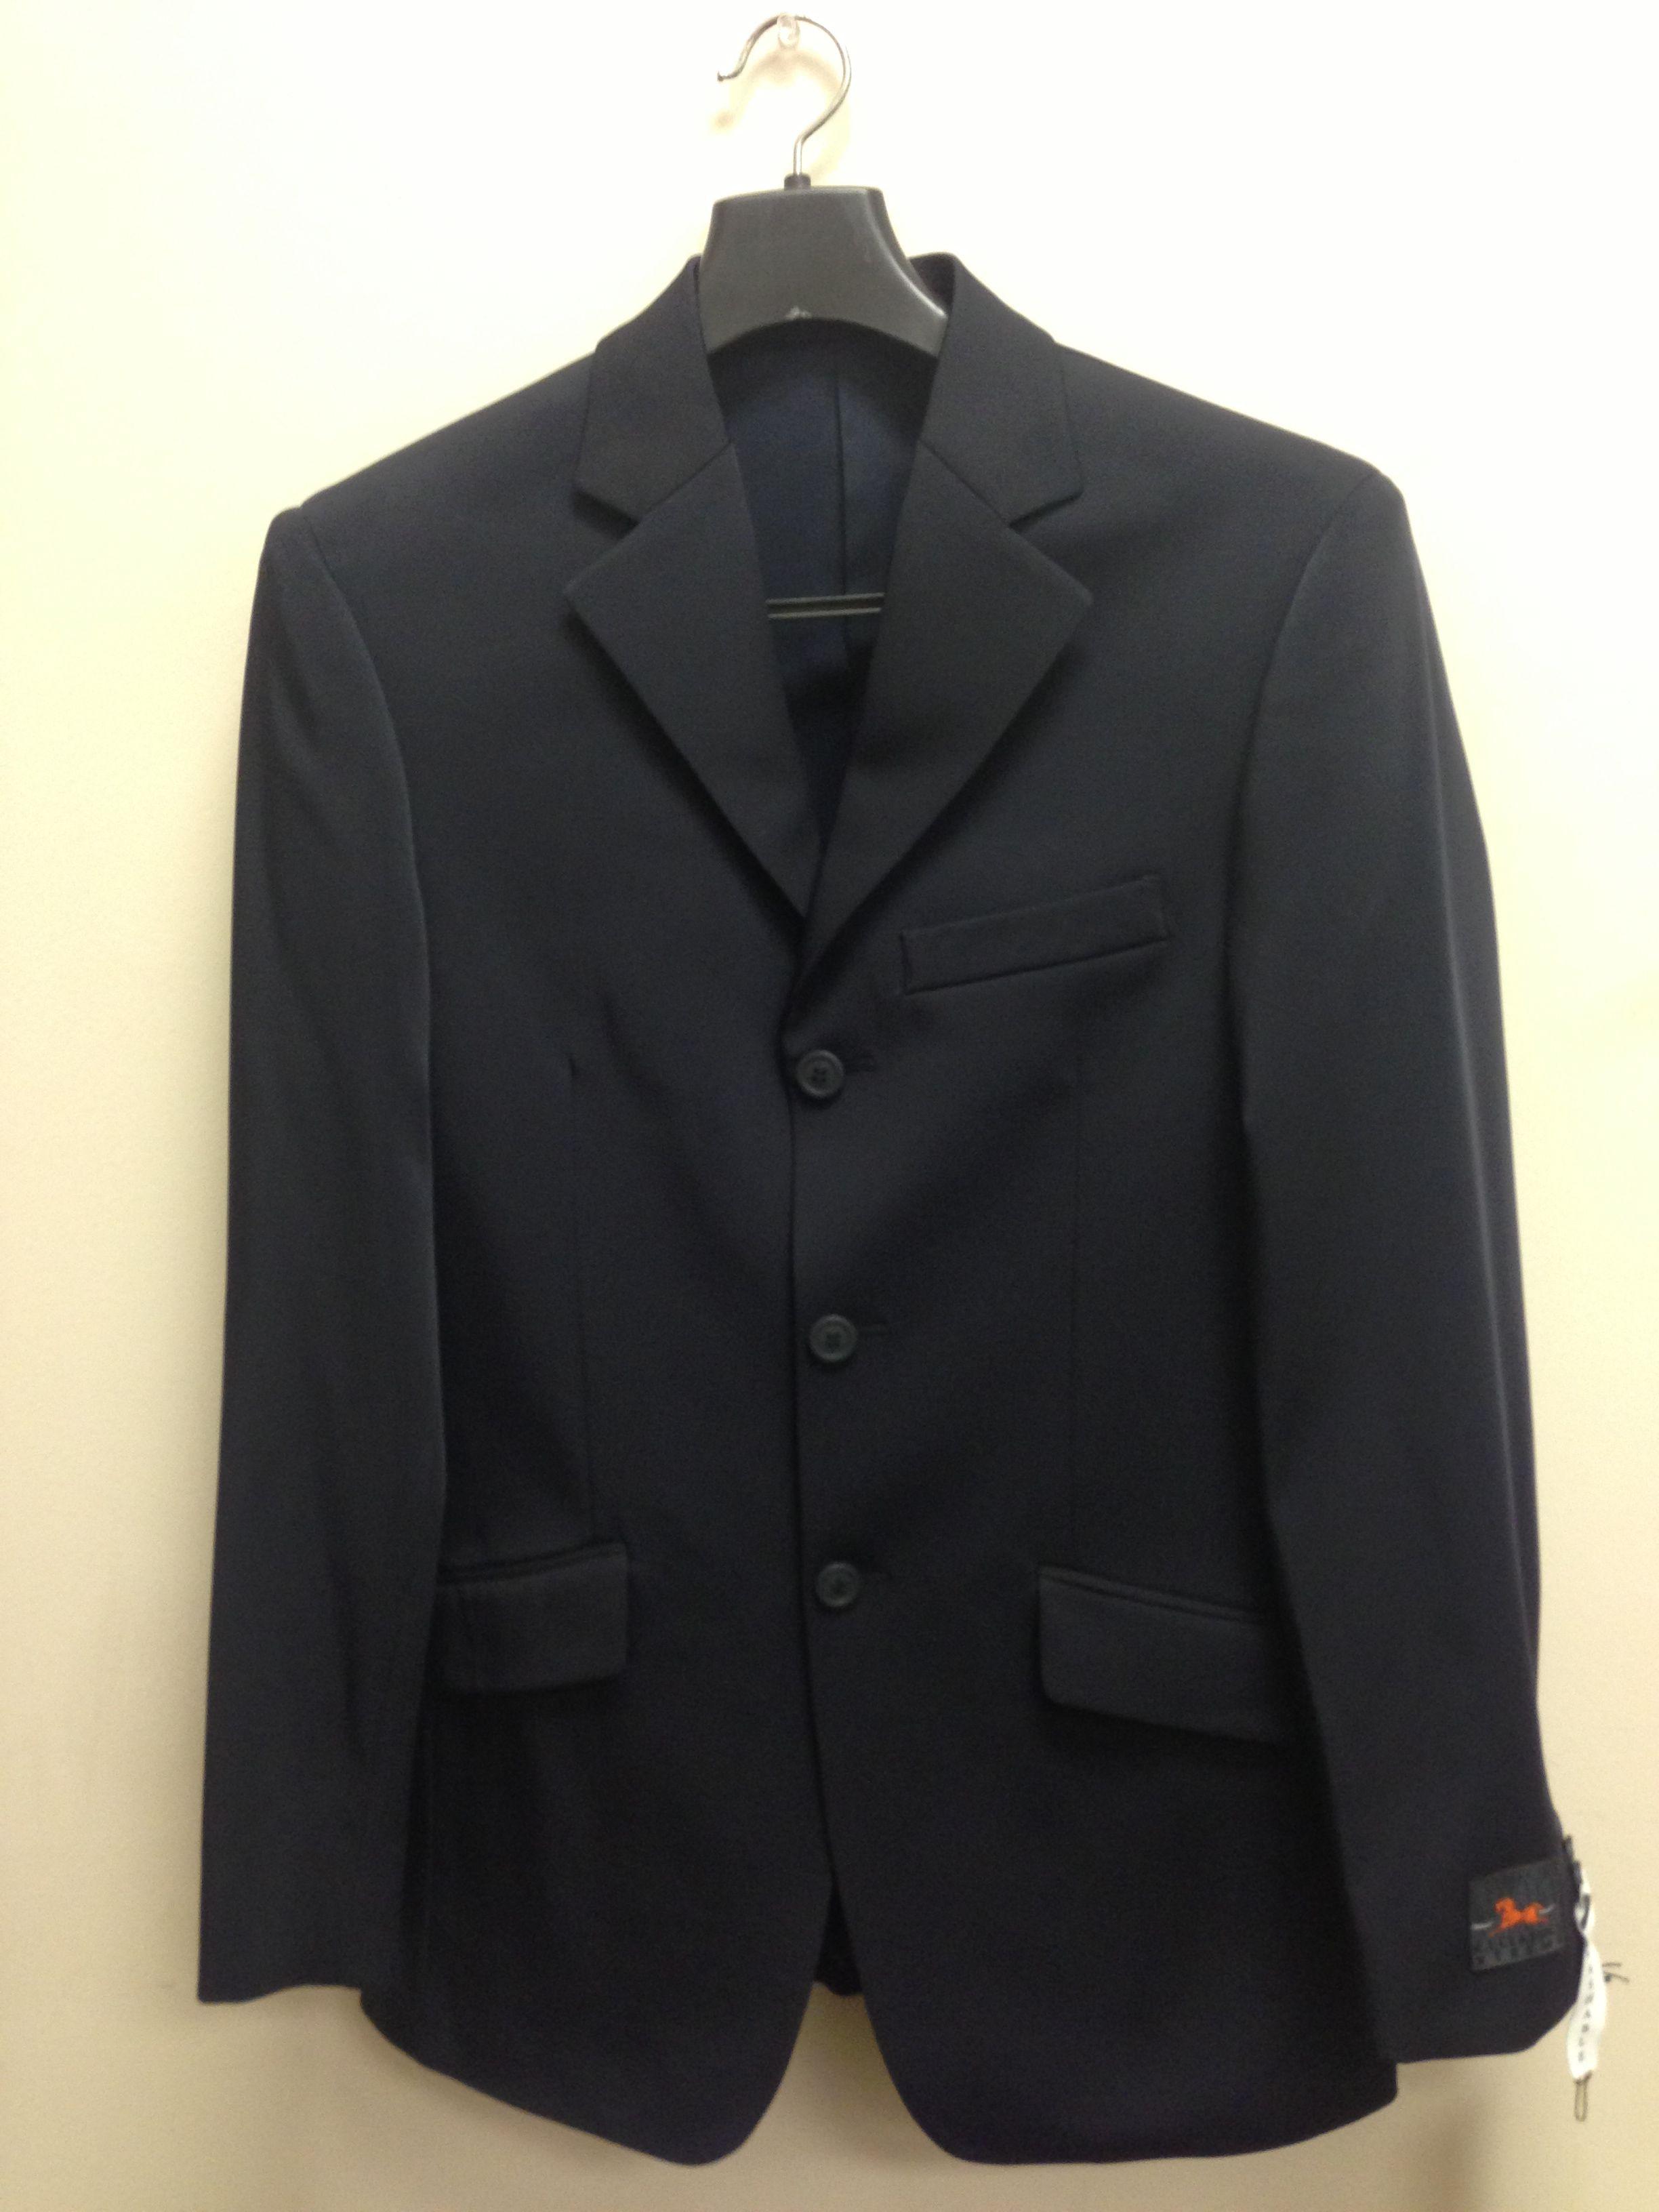 RJ Classics Xtreme Softshell Show Coat - Mens, Navy